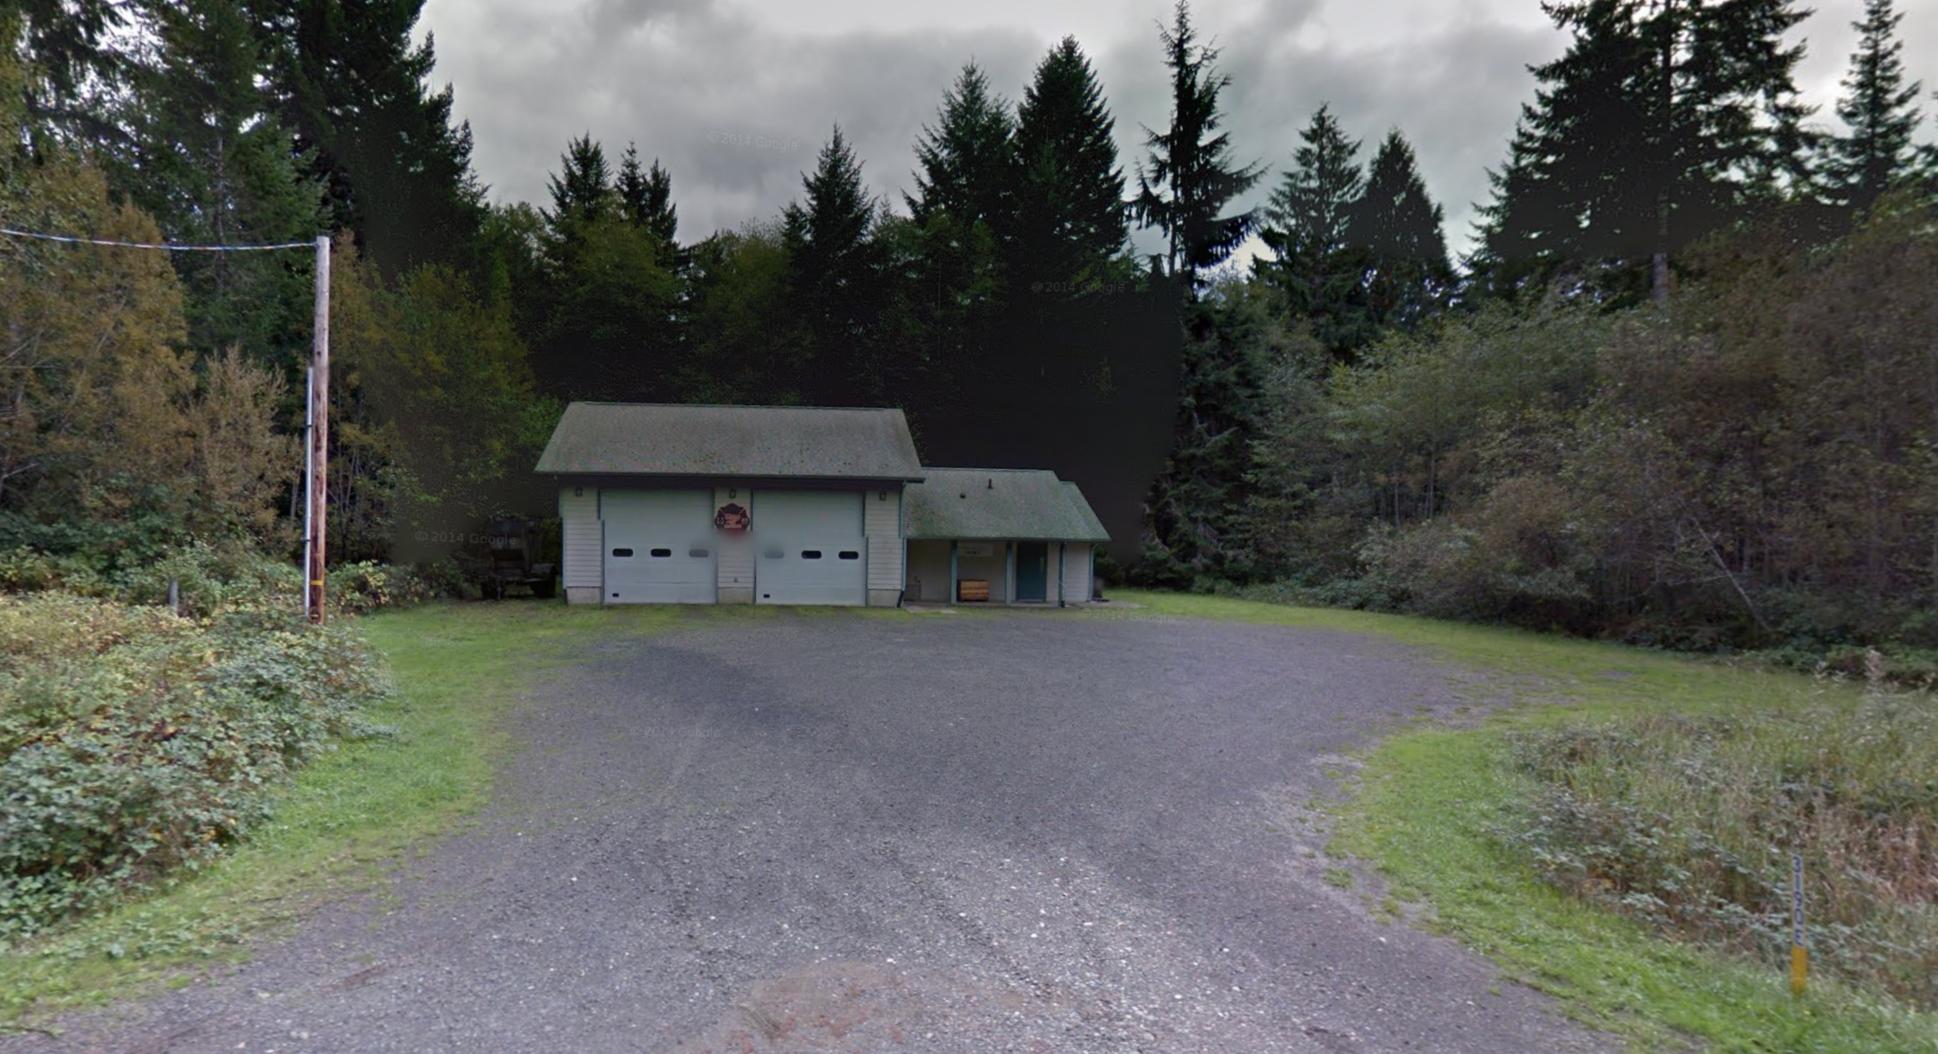 Station 5-9 - Harstine Island North Fire Station  3190 E North Island Dr, Shelton WA